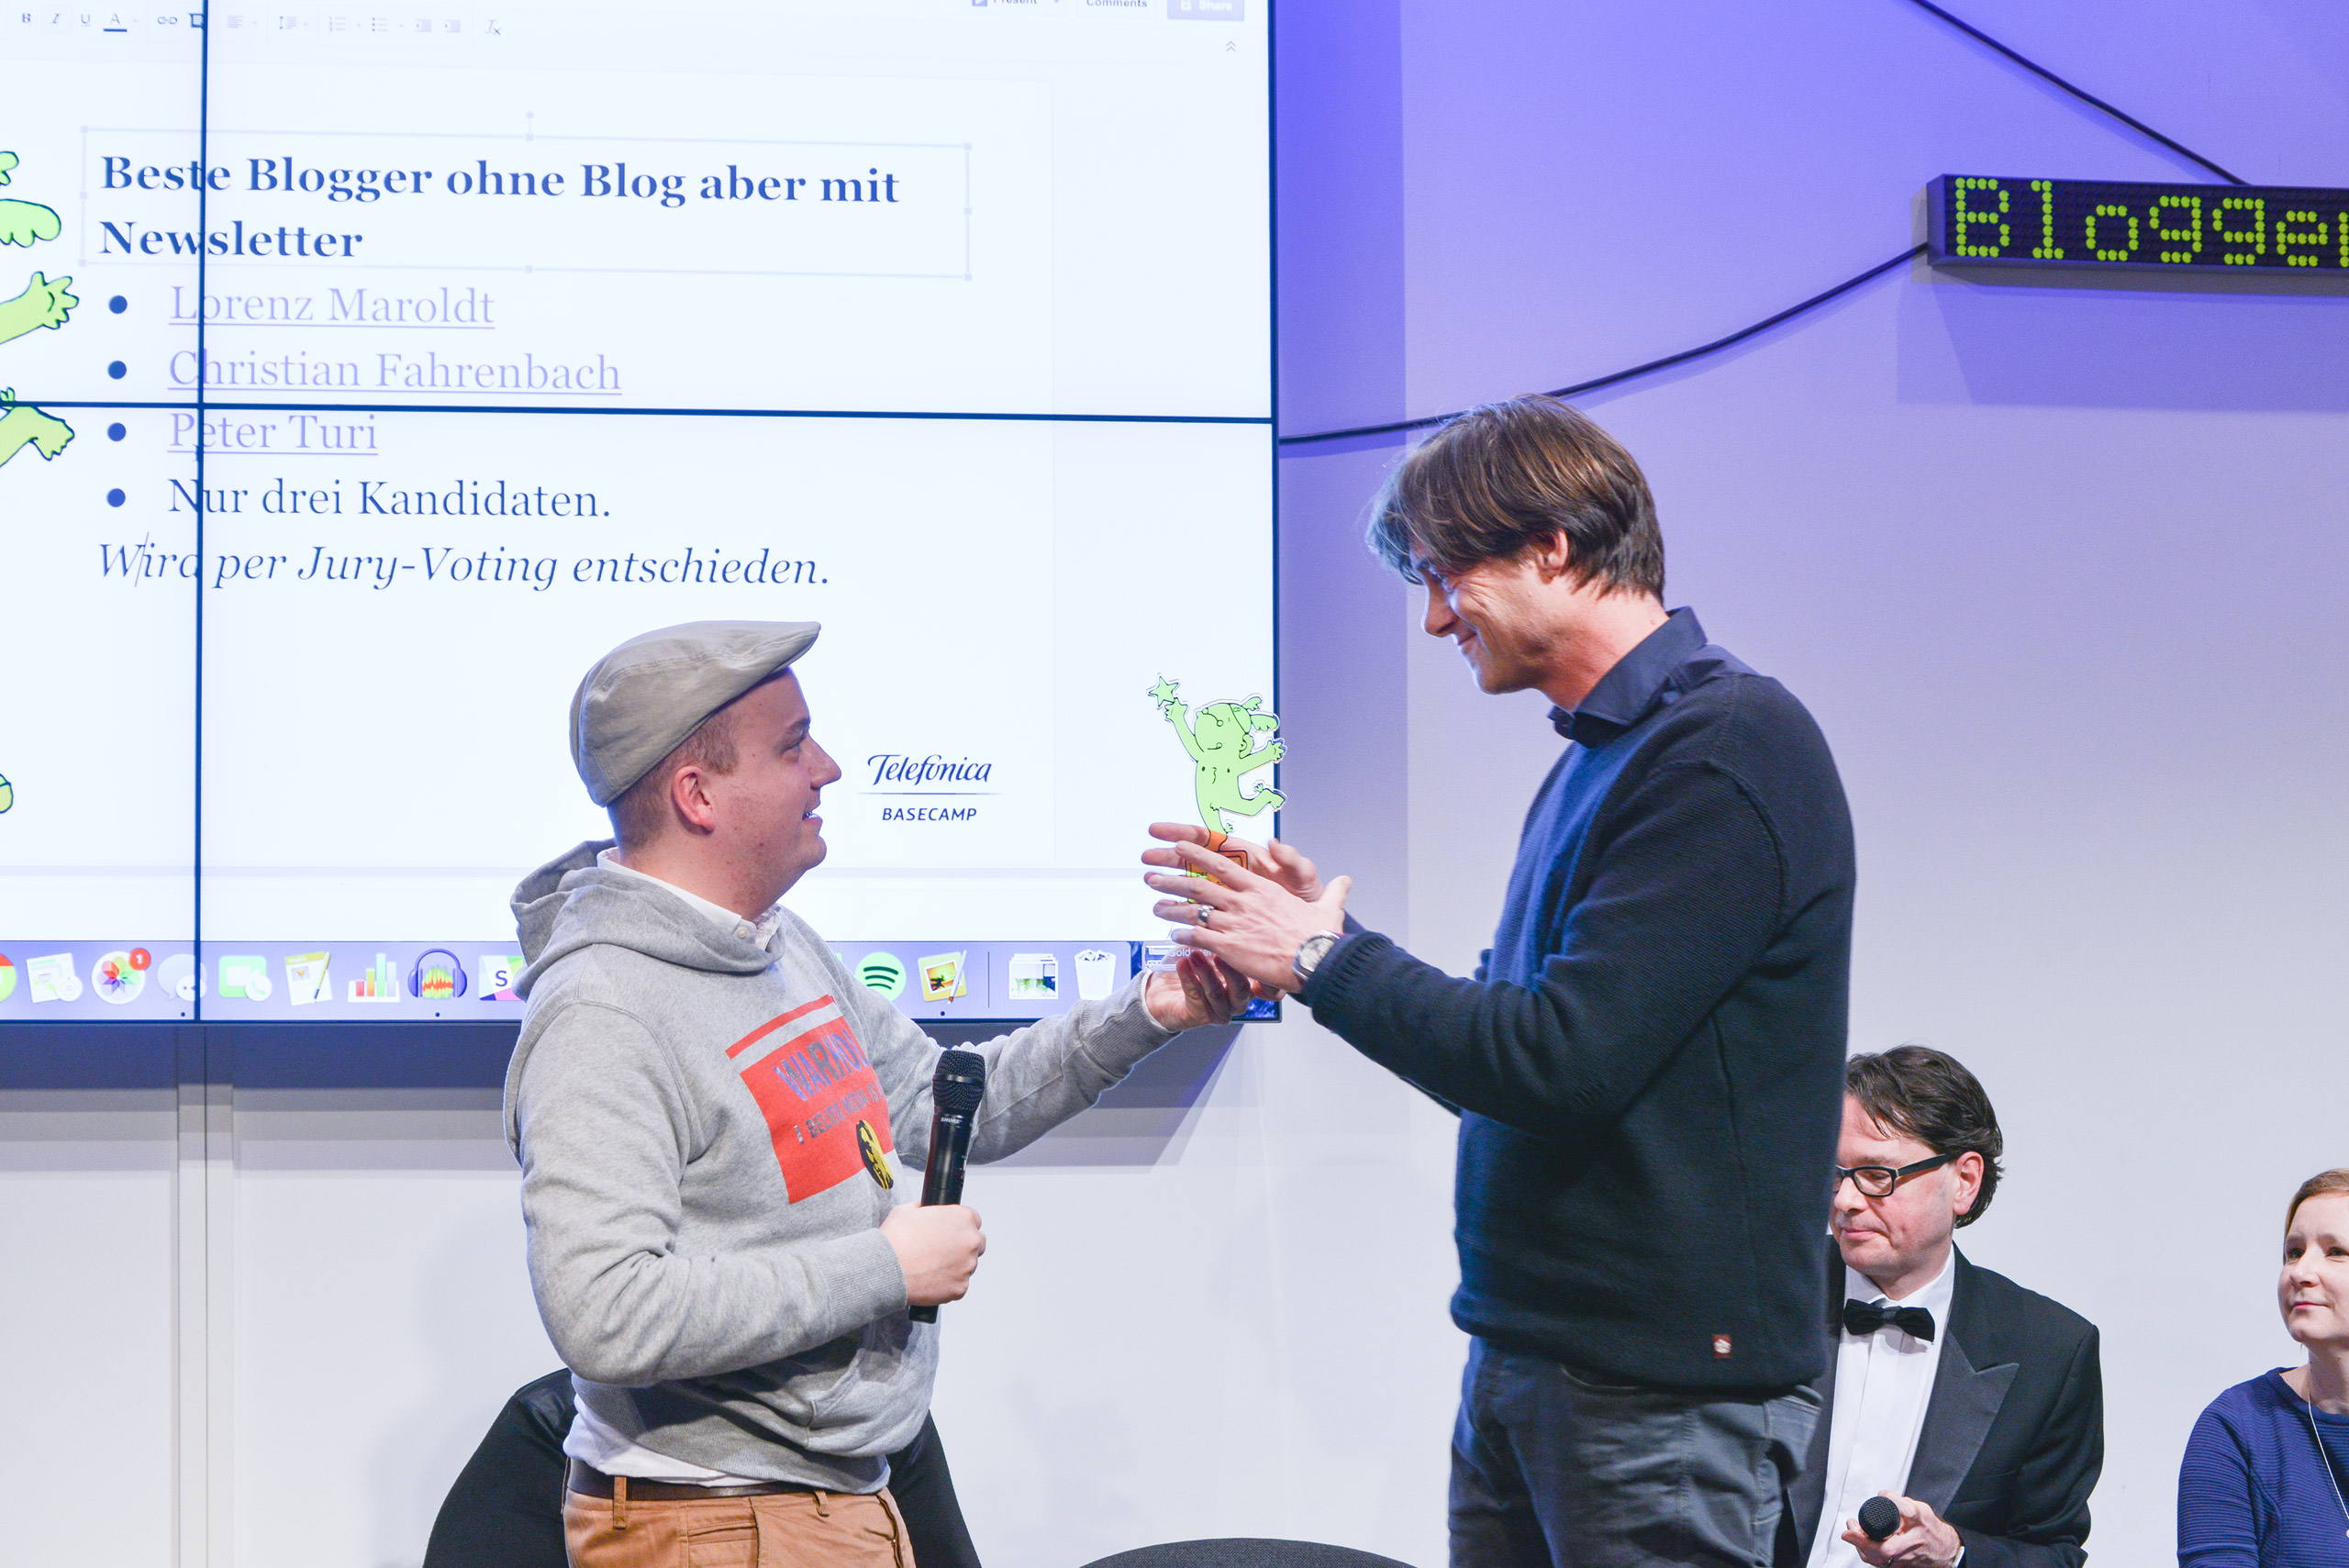 Lorenz Maroldt ist Goldener #Blogger2015